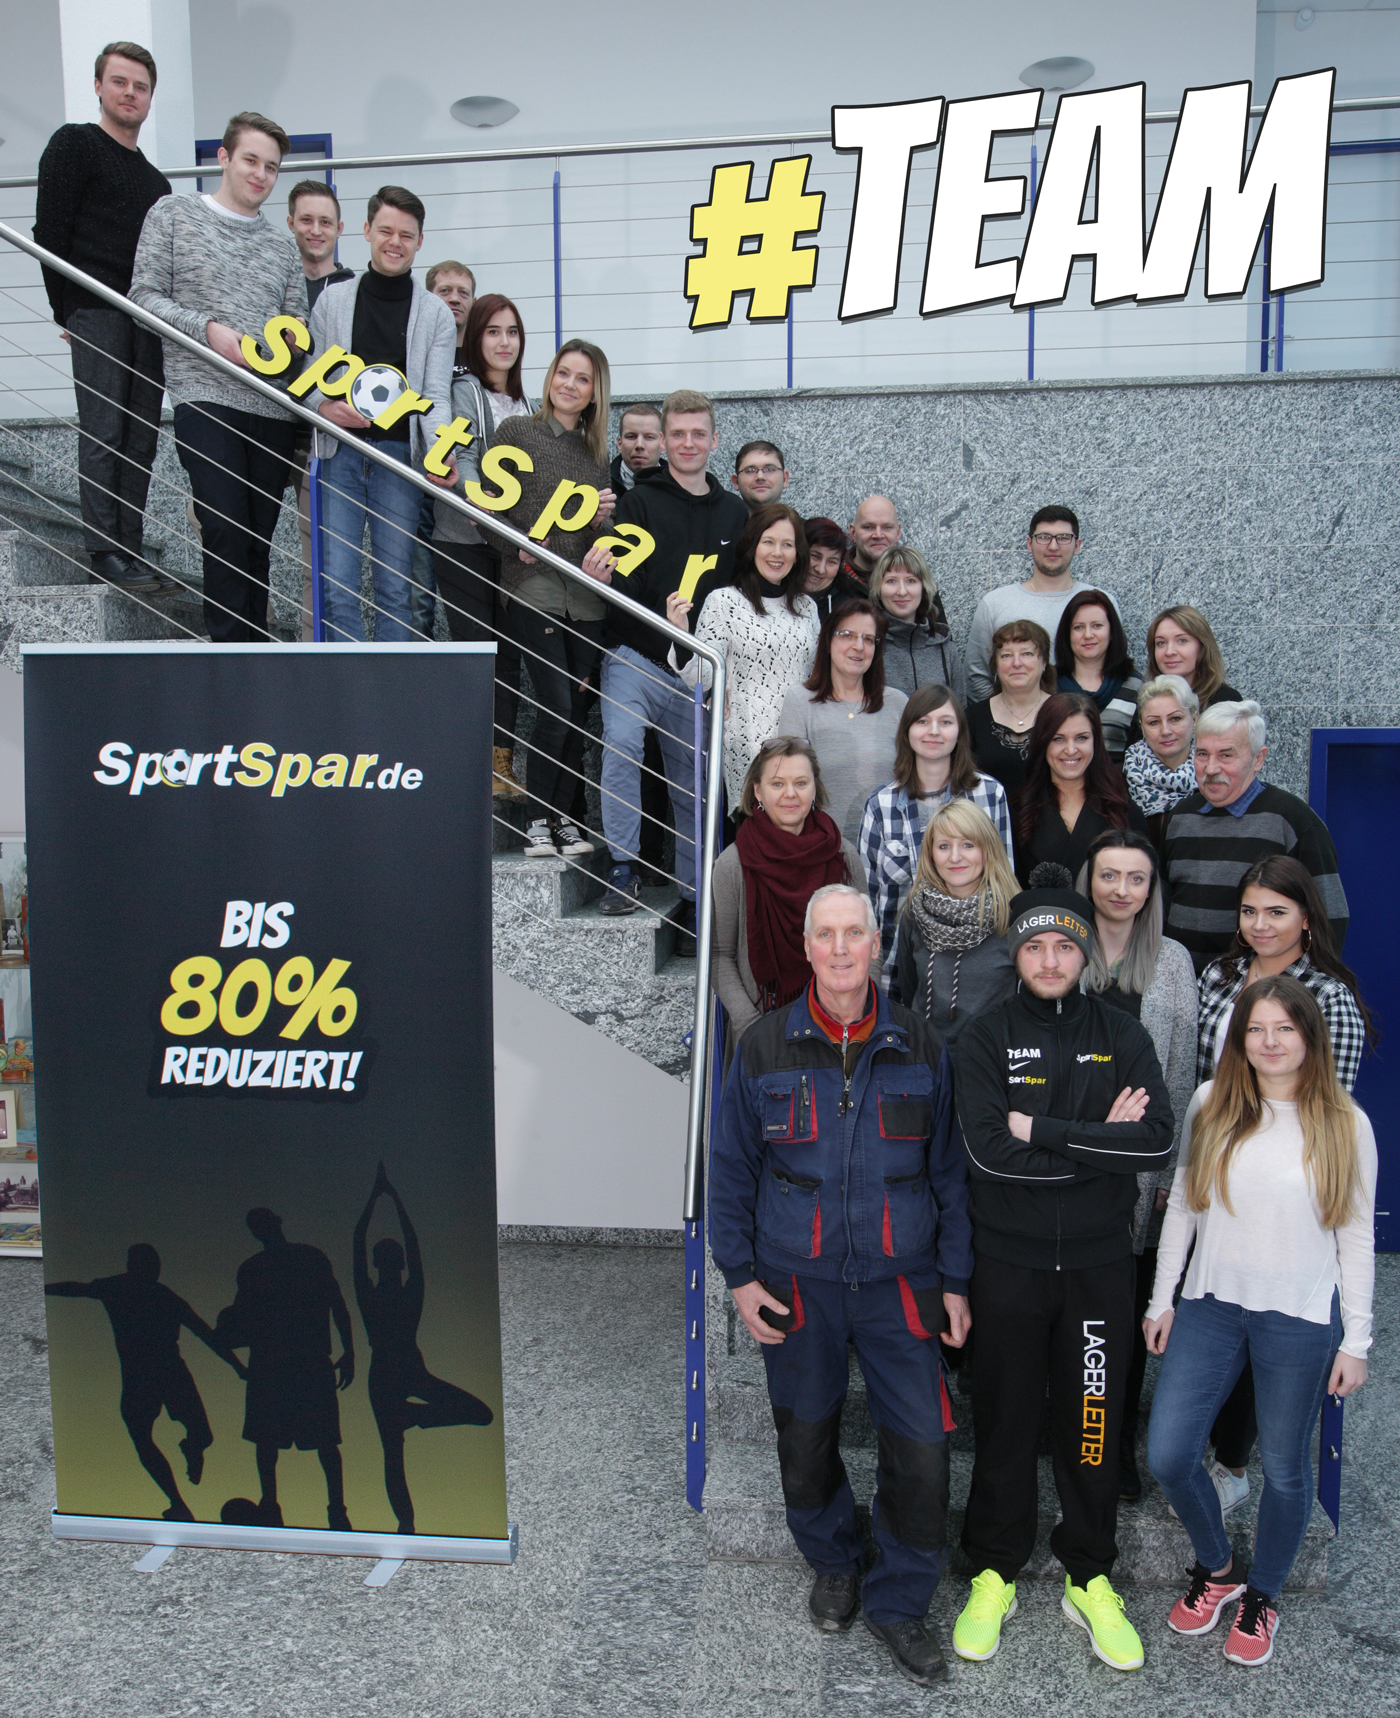 Sportspar Team